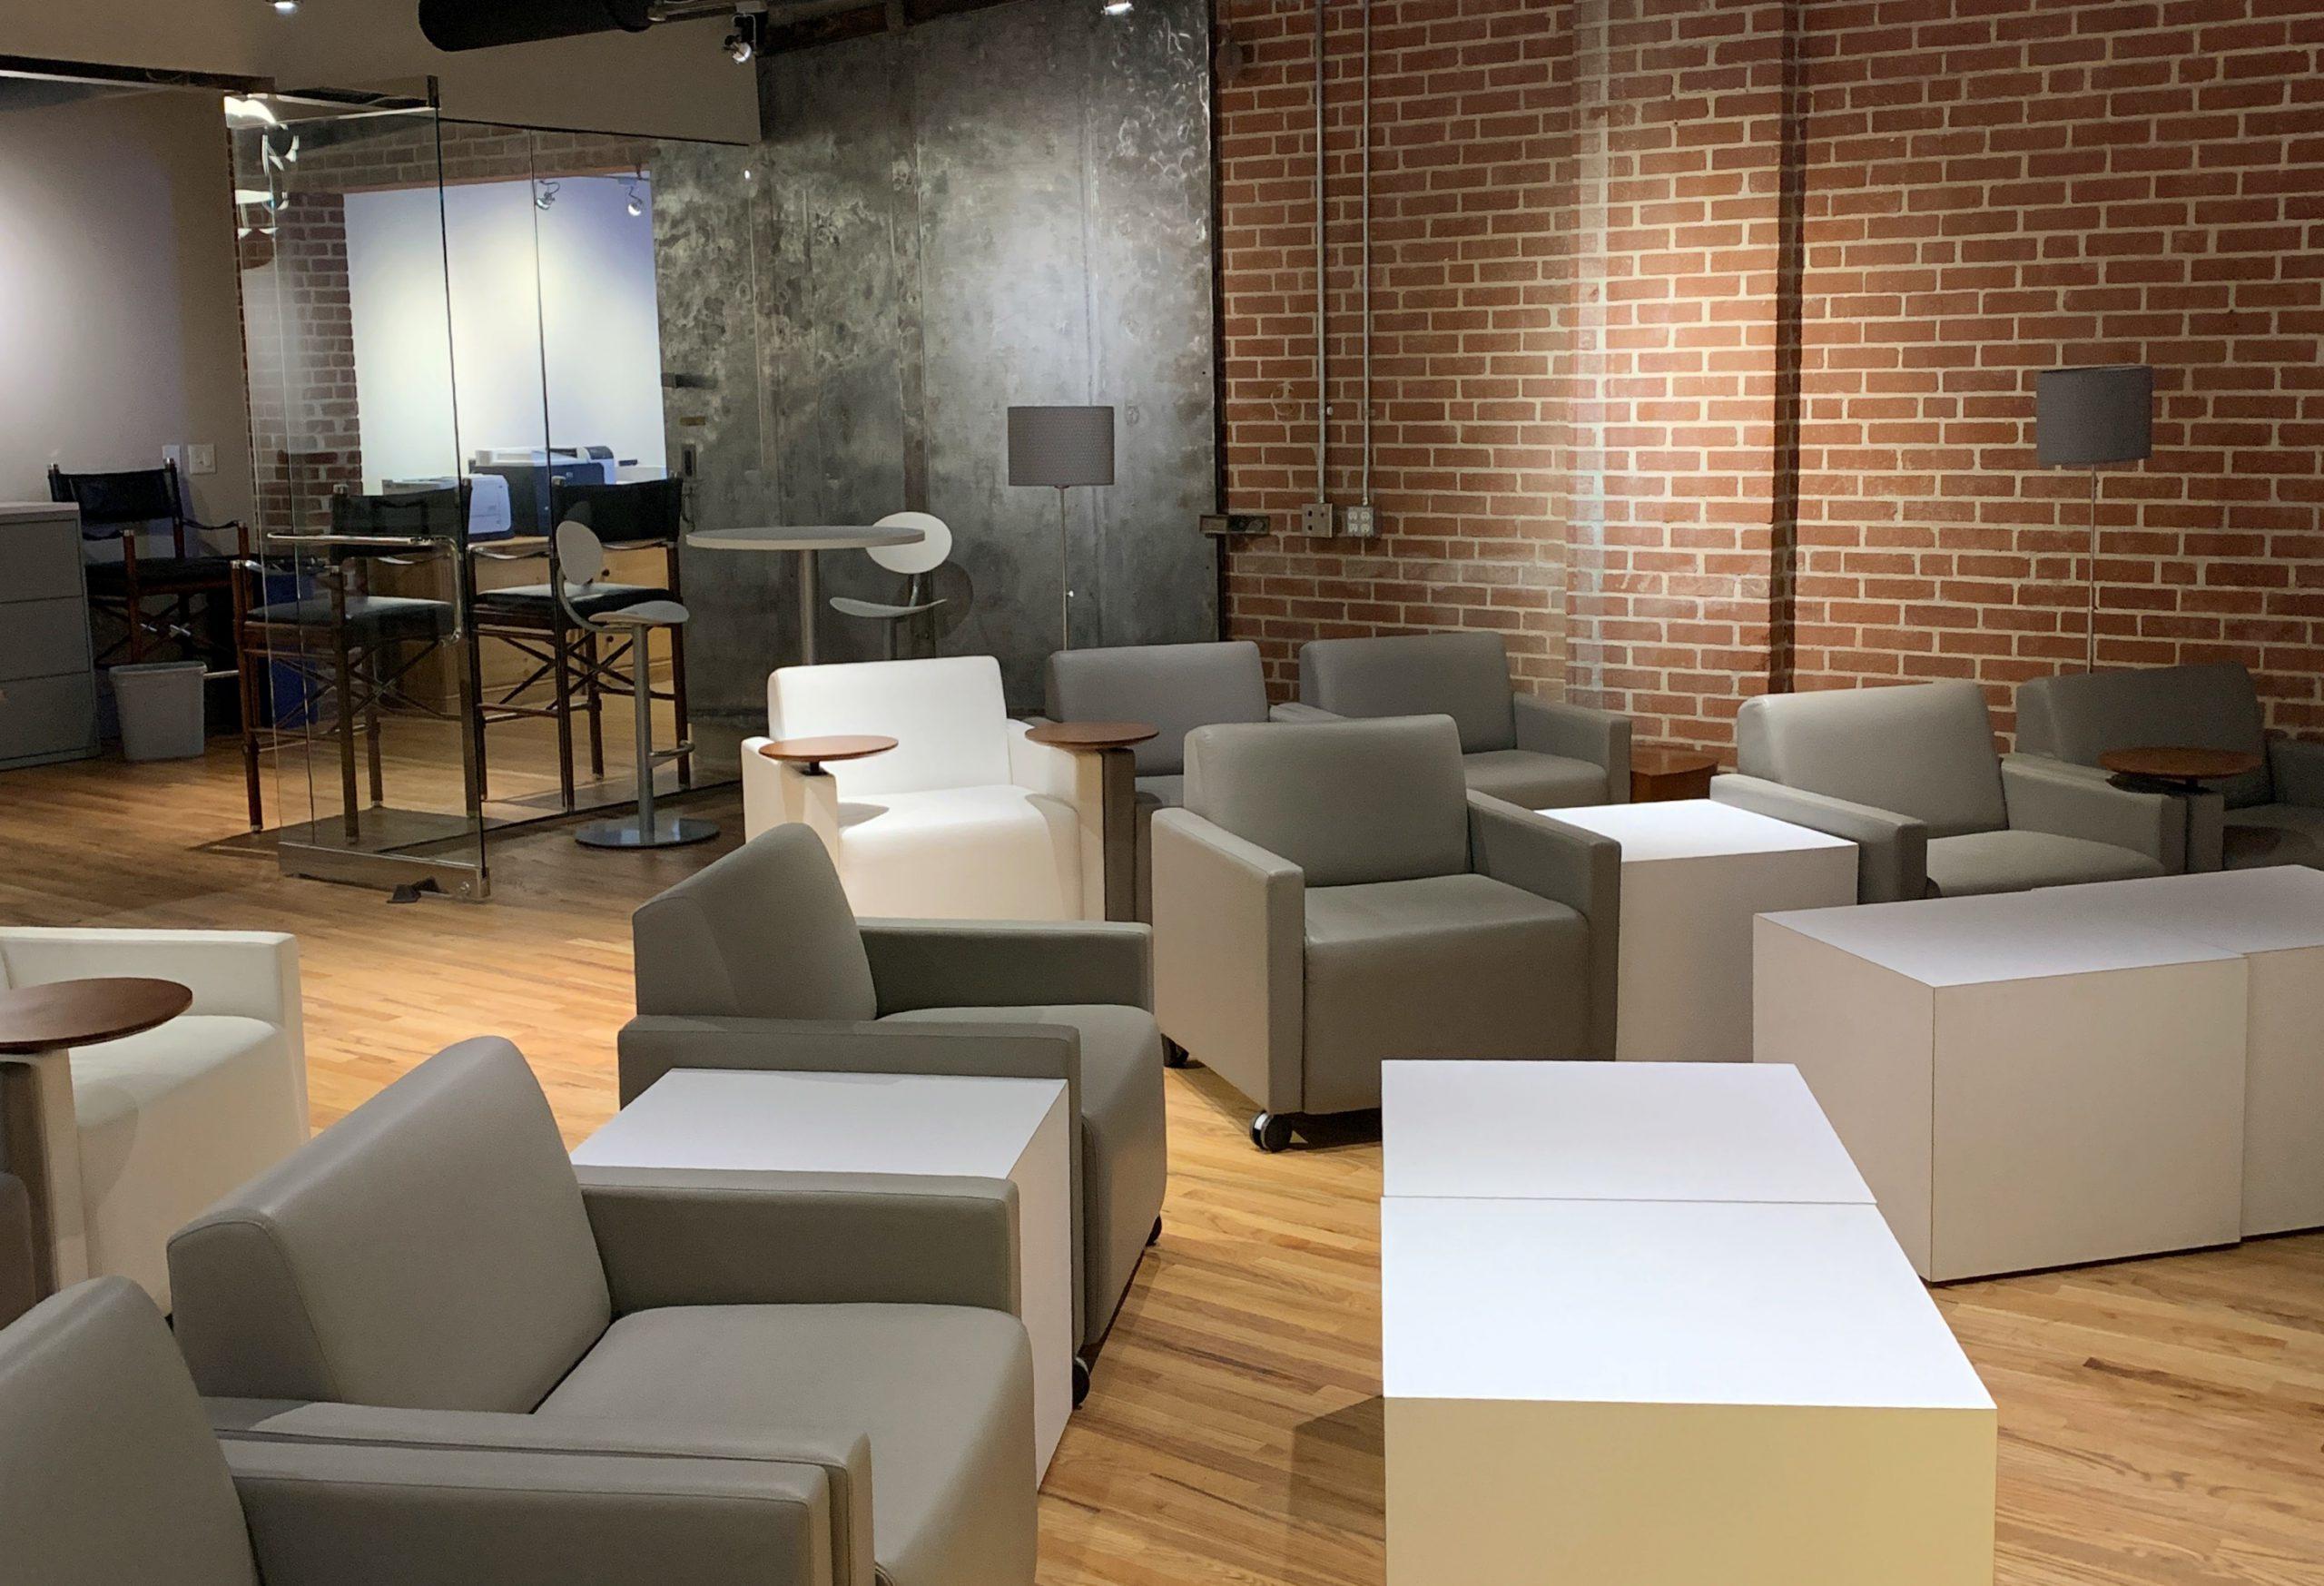 Fishbowl Meeting room